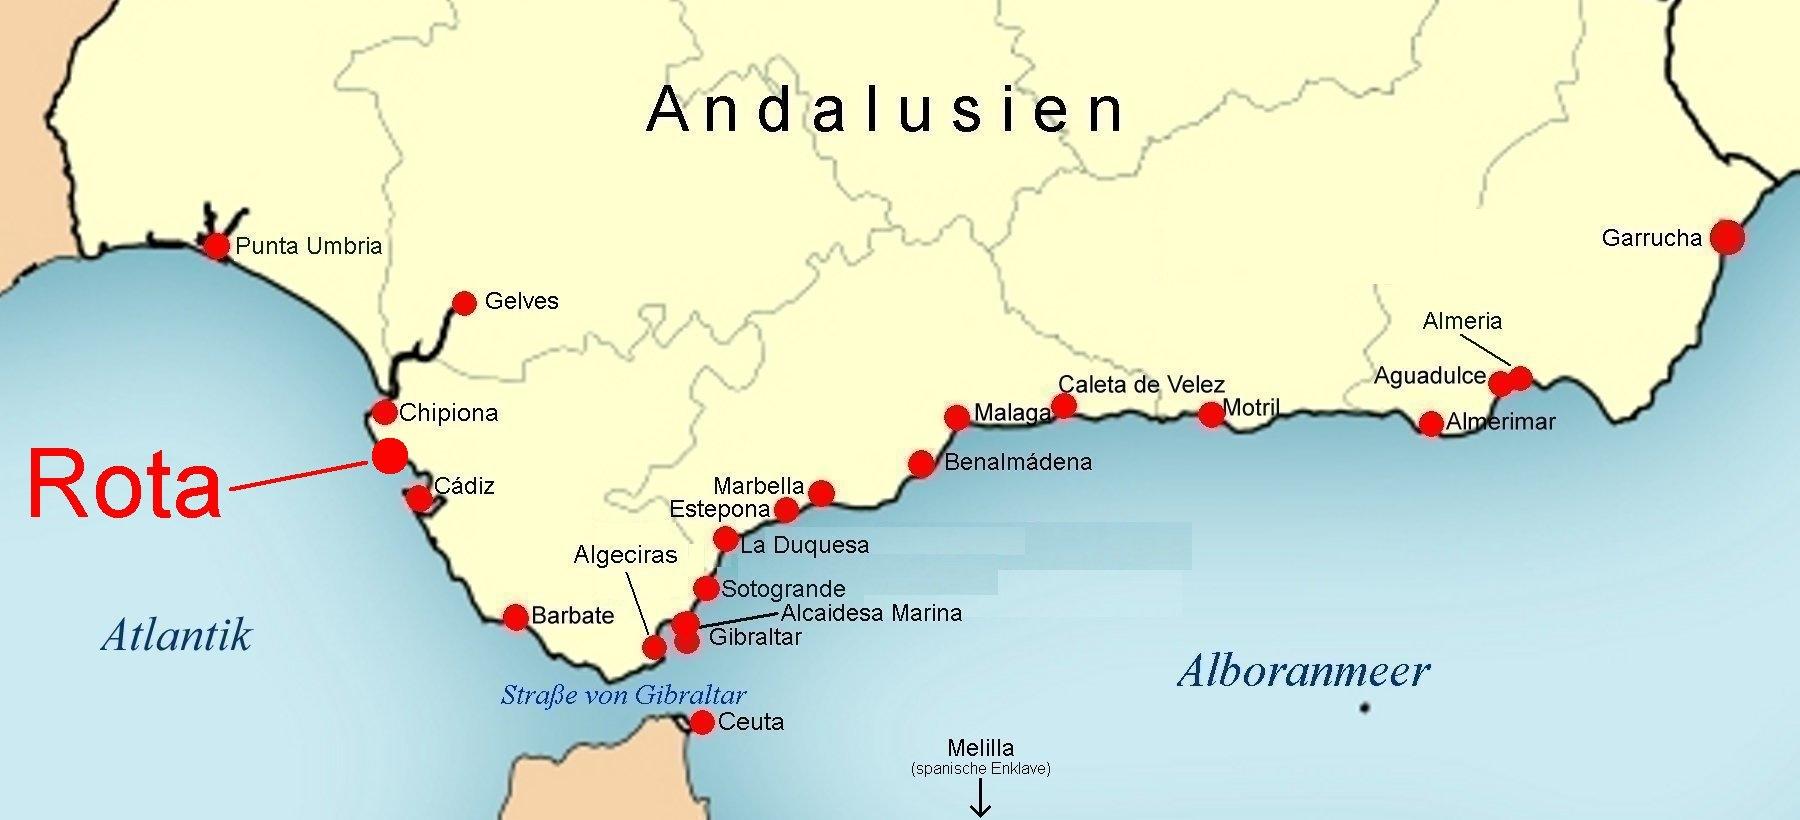 Karte Andalusien Cadiz.Online Hafenhandbuch Spanien Rota Marina Andalusien